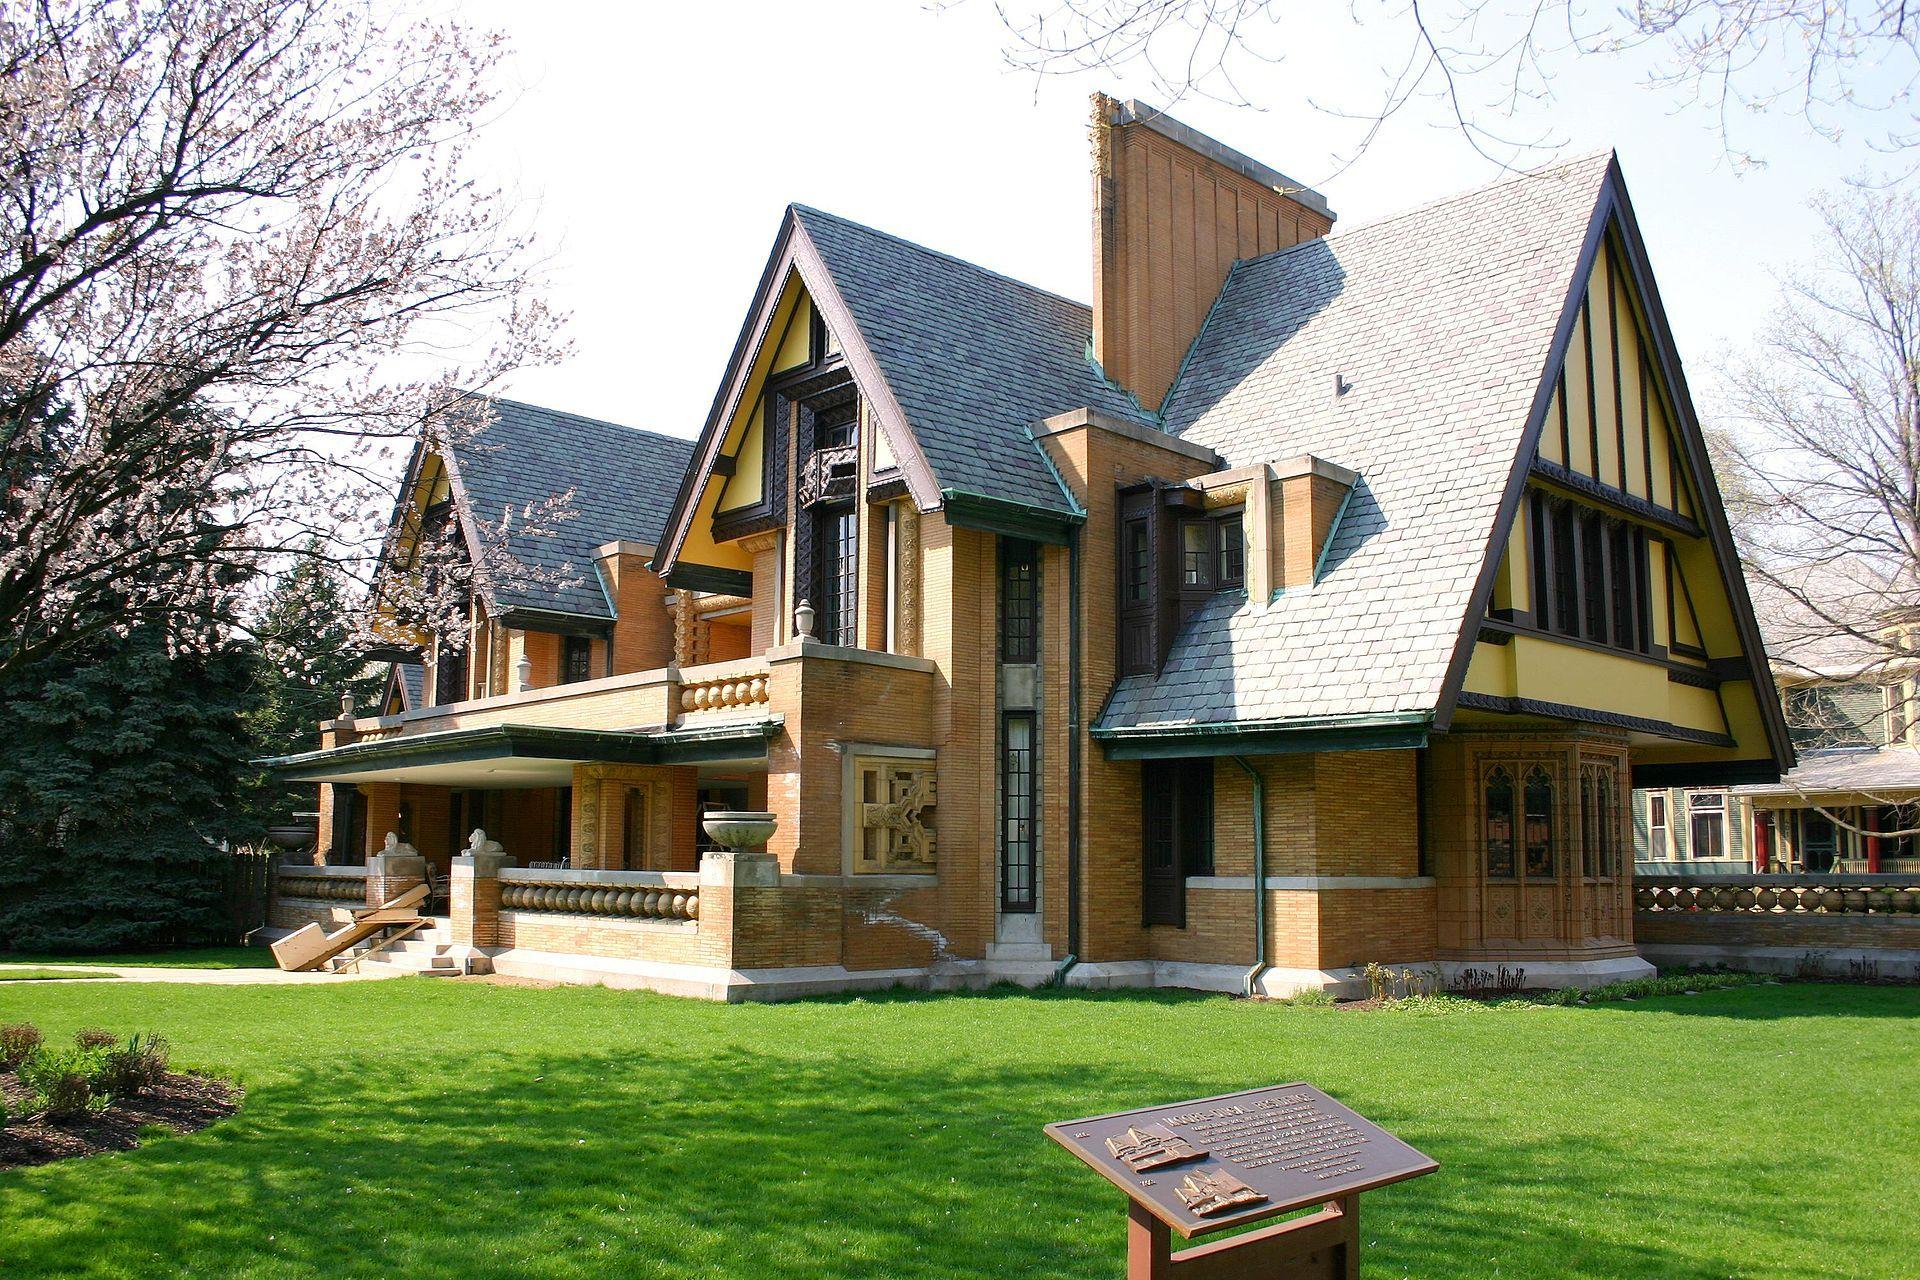 viel rabatt genießen neues Erscheinungsbild guter Service 2010-04-10 3000x2000 oakpark nathan g moore house - Frank ...